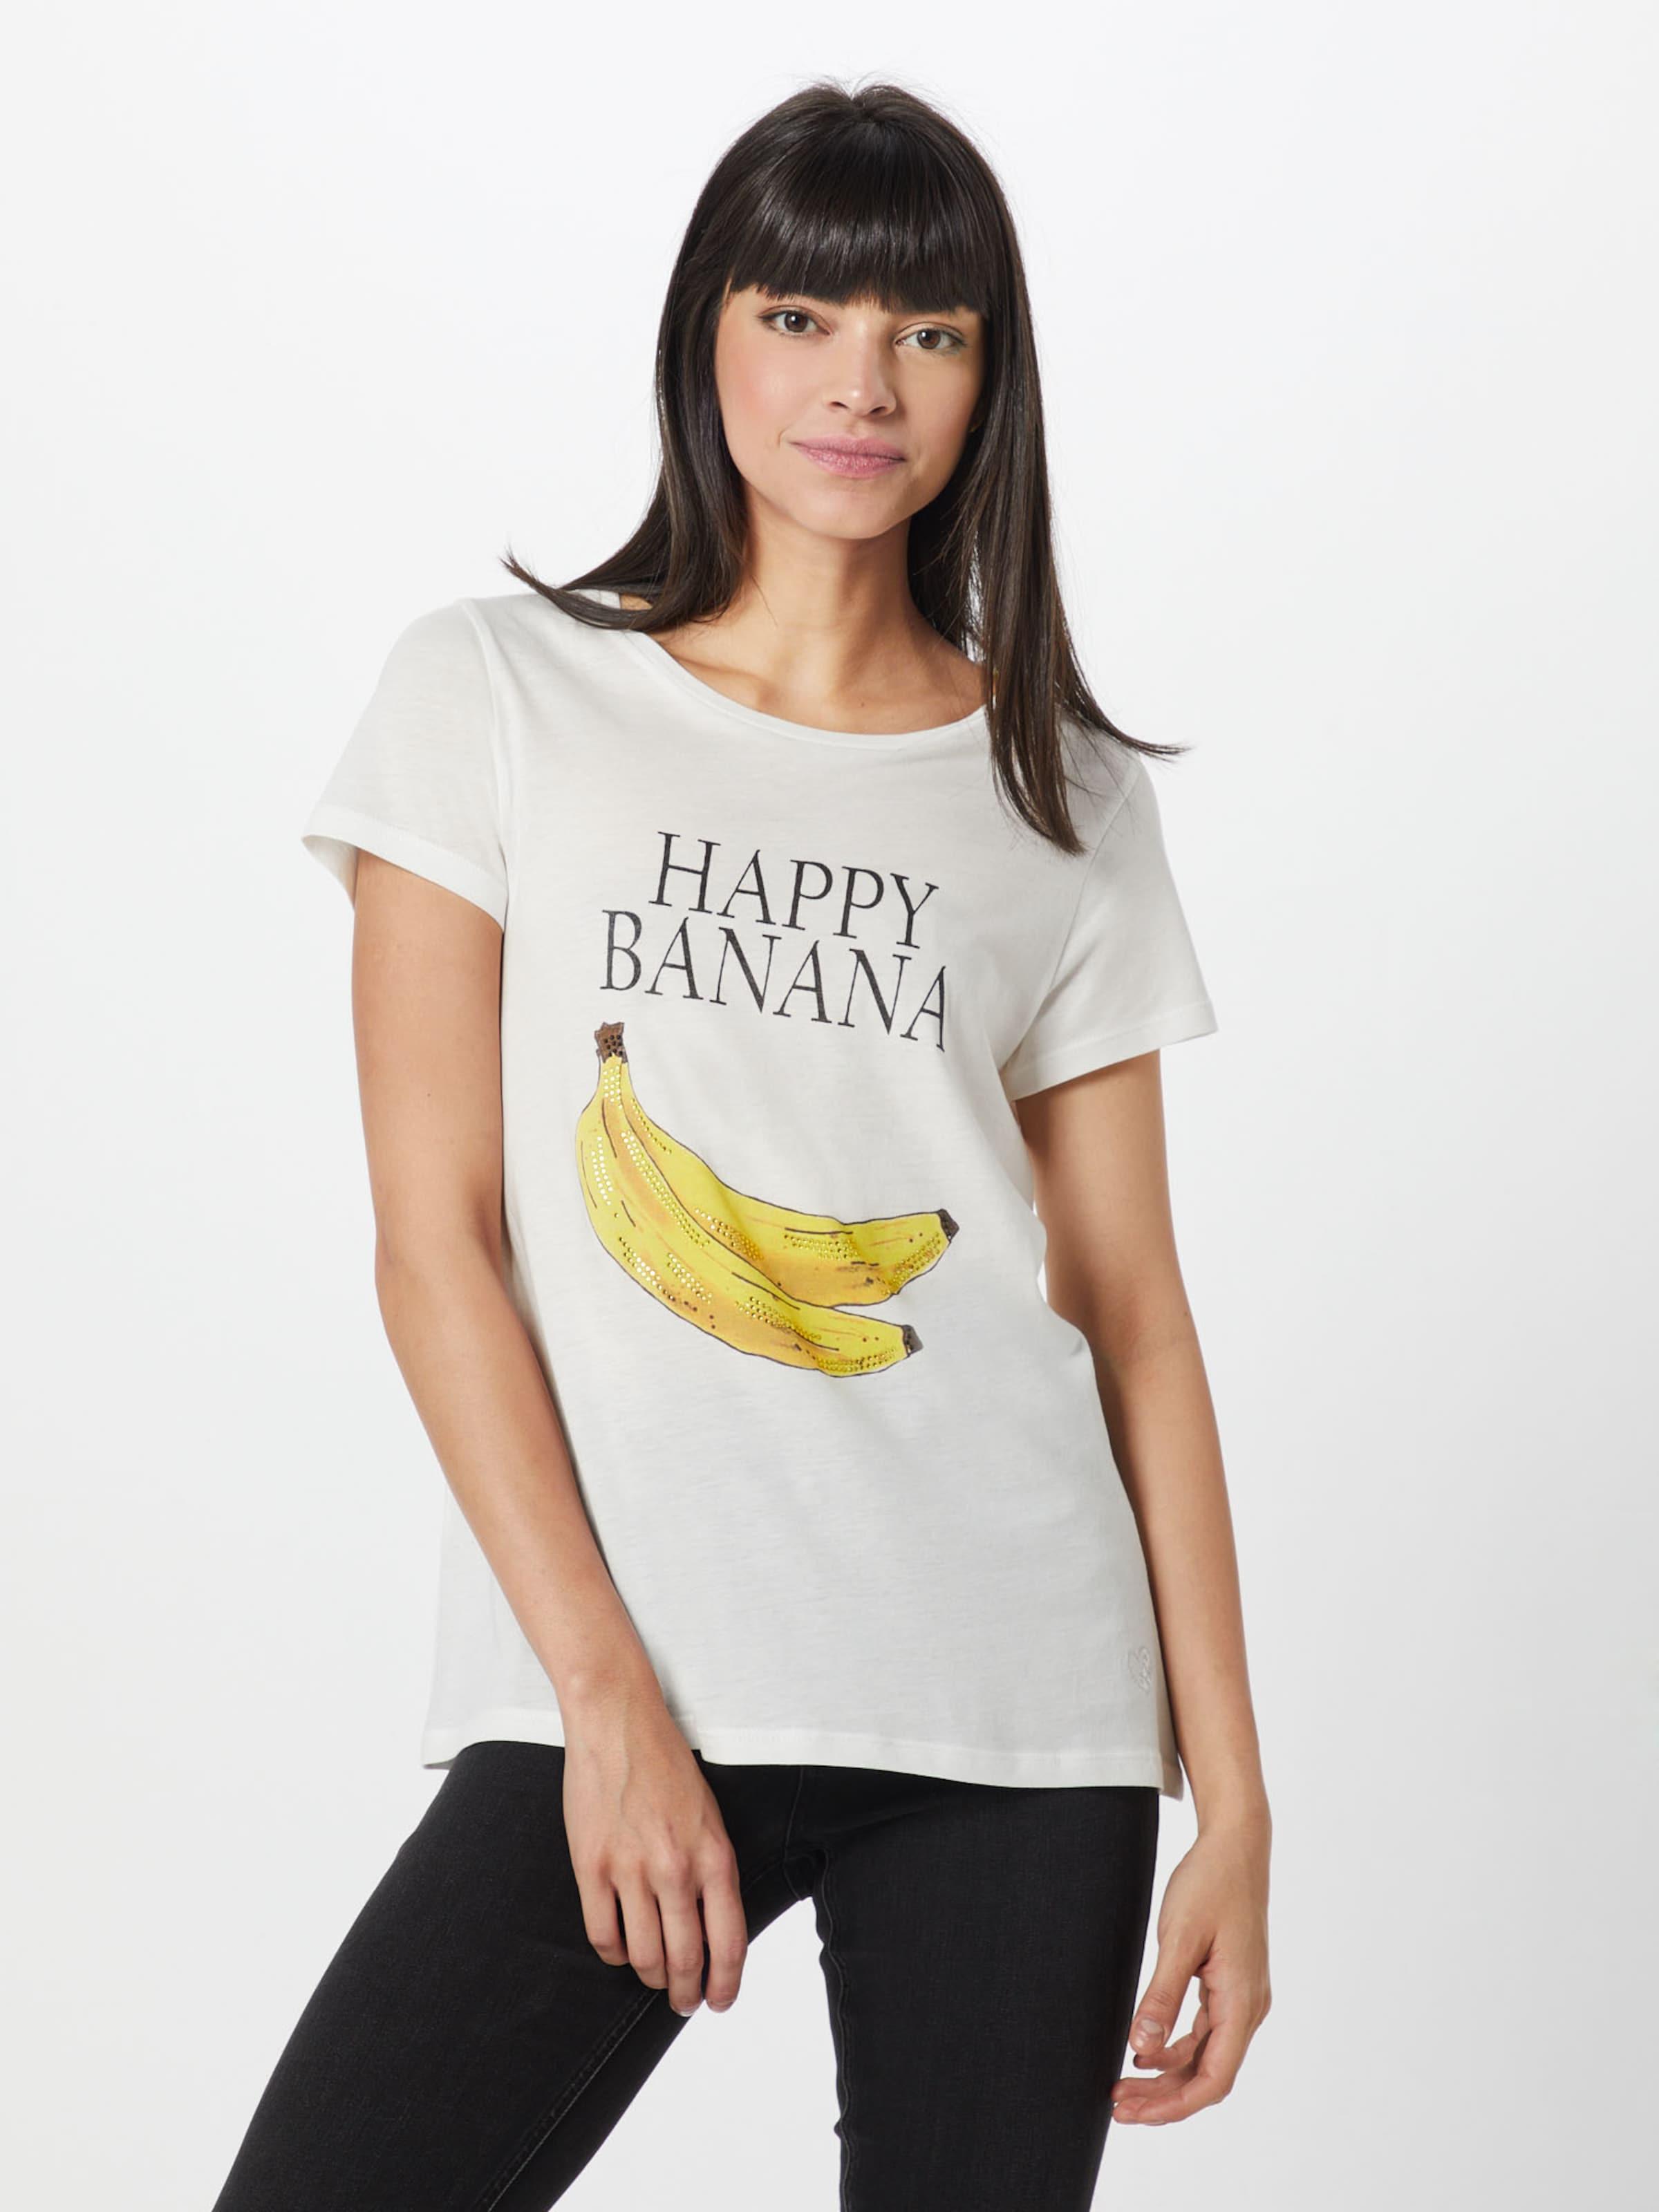 Banana Shirt 'shirt In Frogbox Weiß Print' With kuPXiOZ